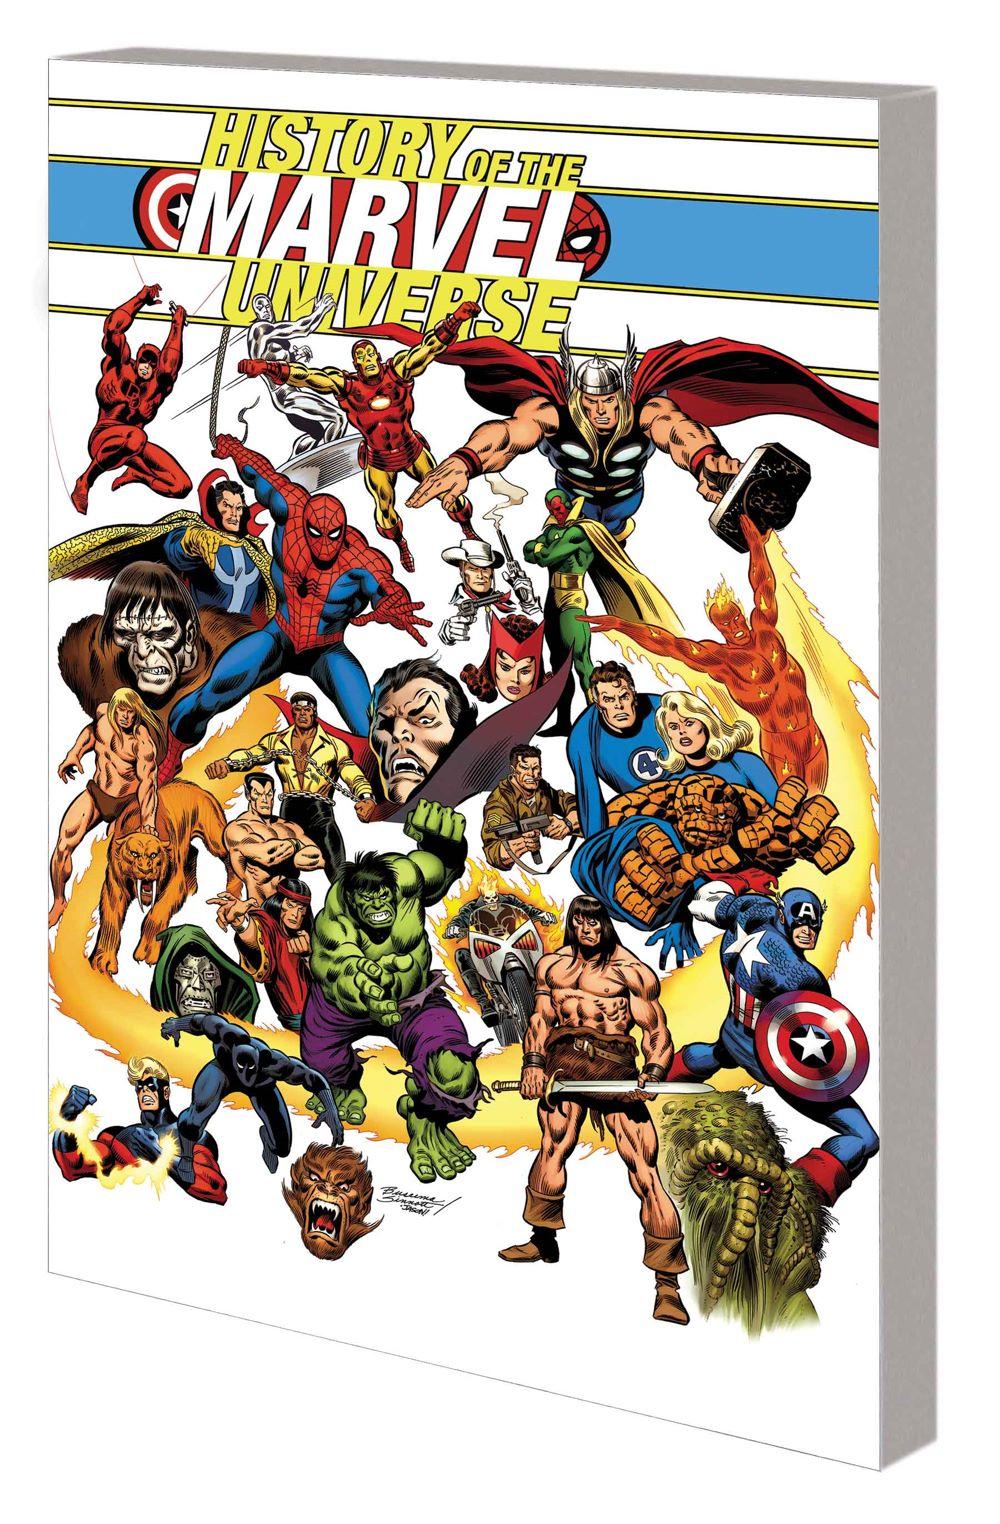 HISTORY_OF_MARVEL_TPB_DM Marvel Comics June 2021 Solicitations